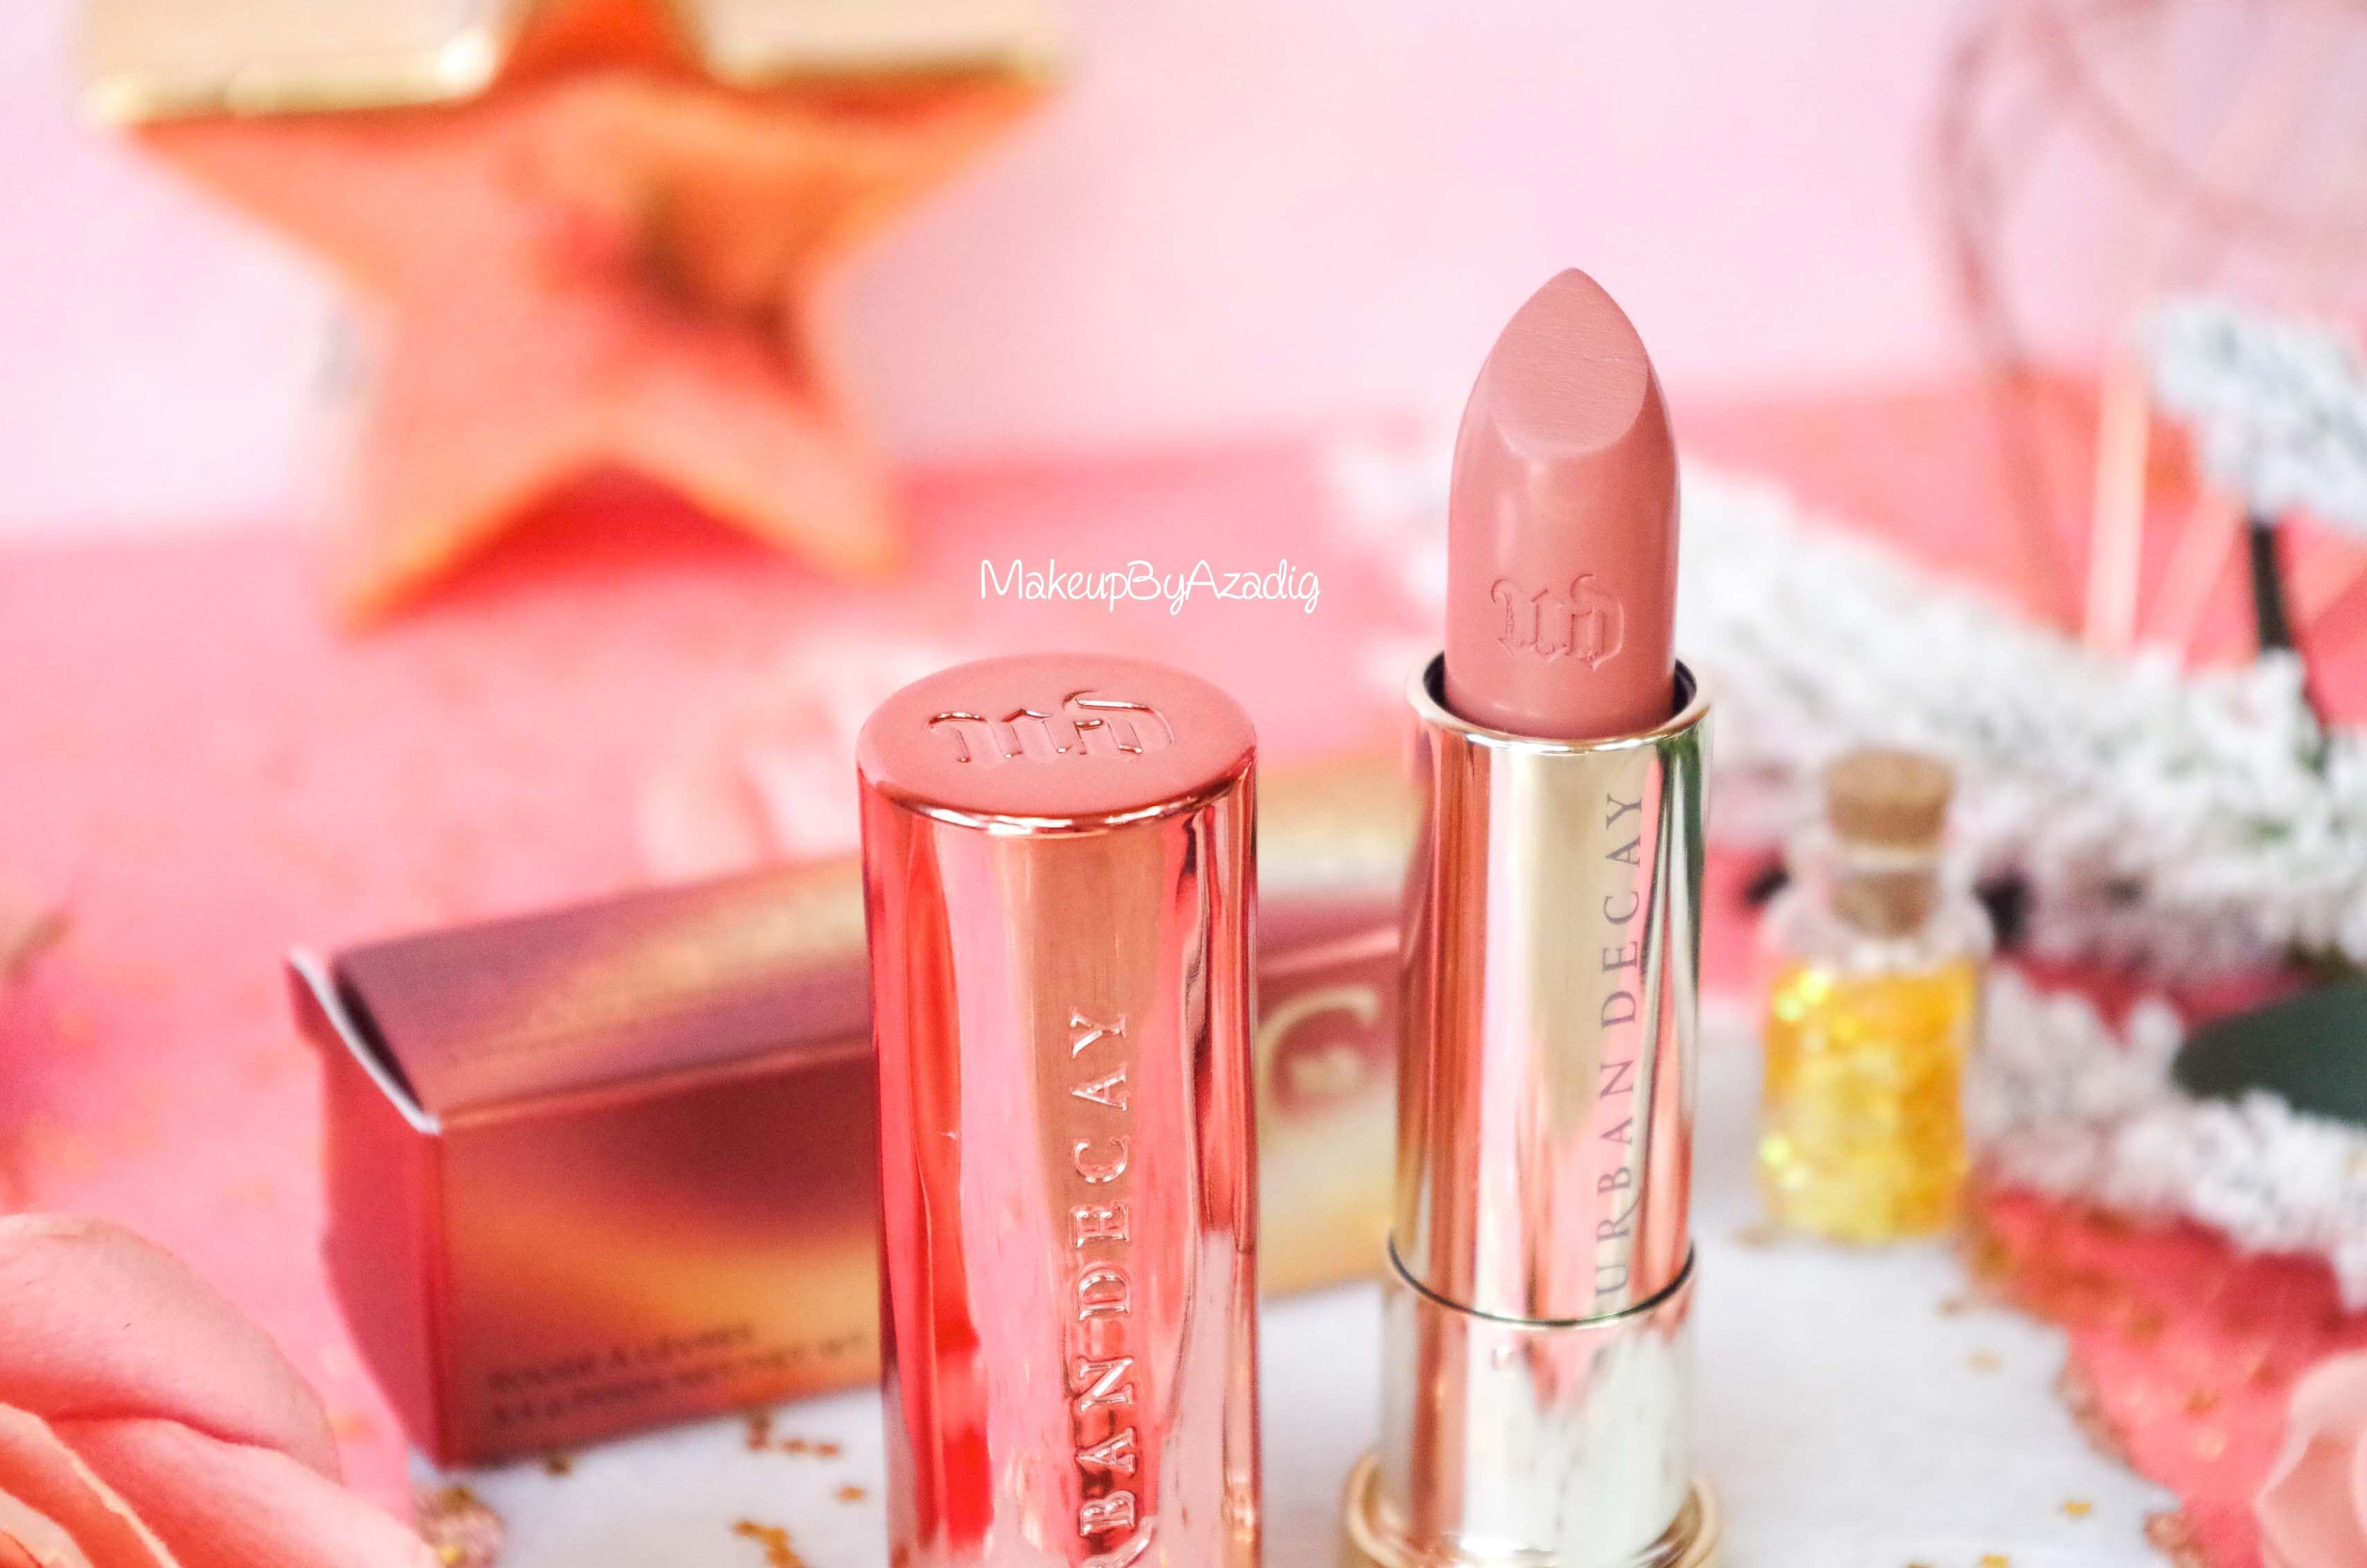 teinte-revue-review-naked-heat-vice-lipstick-fuel-heat-scorched-sephora-urban-decay-makeupbyazadig-prix-avis-troyes